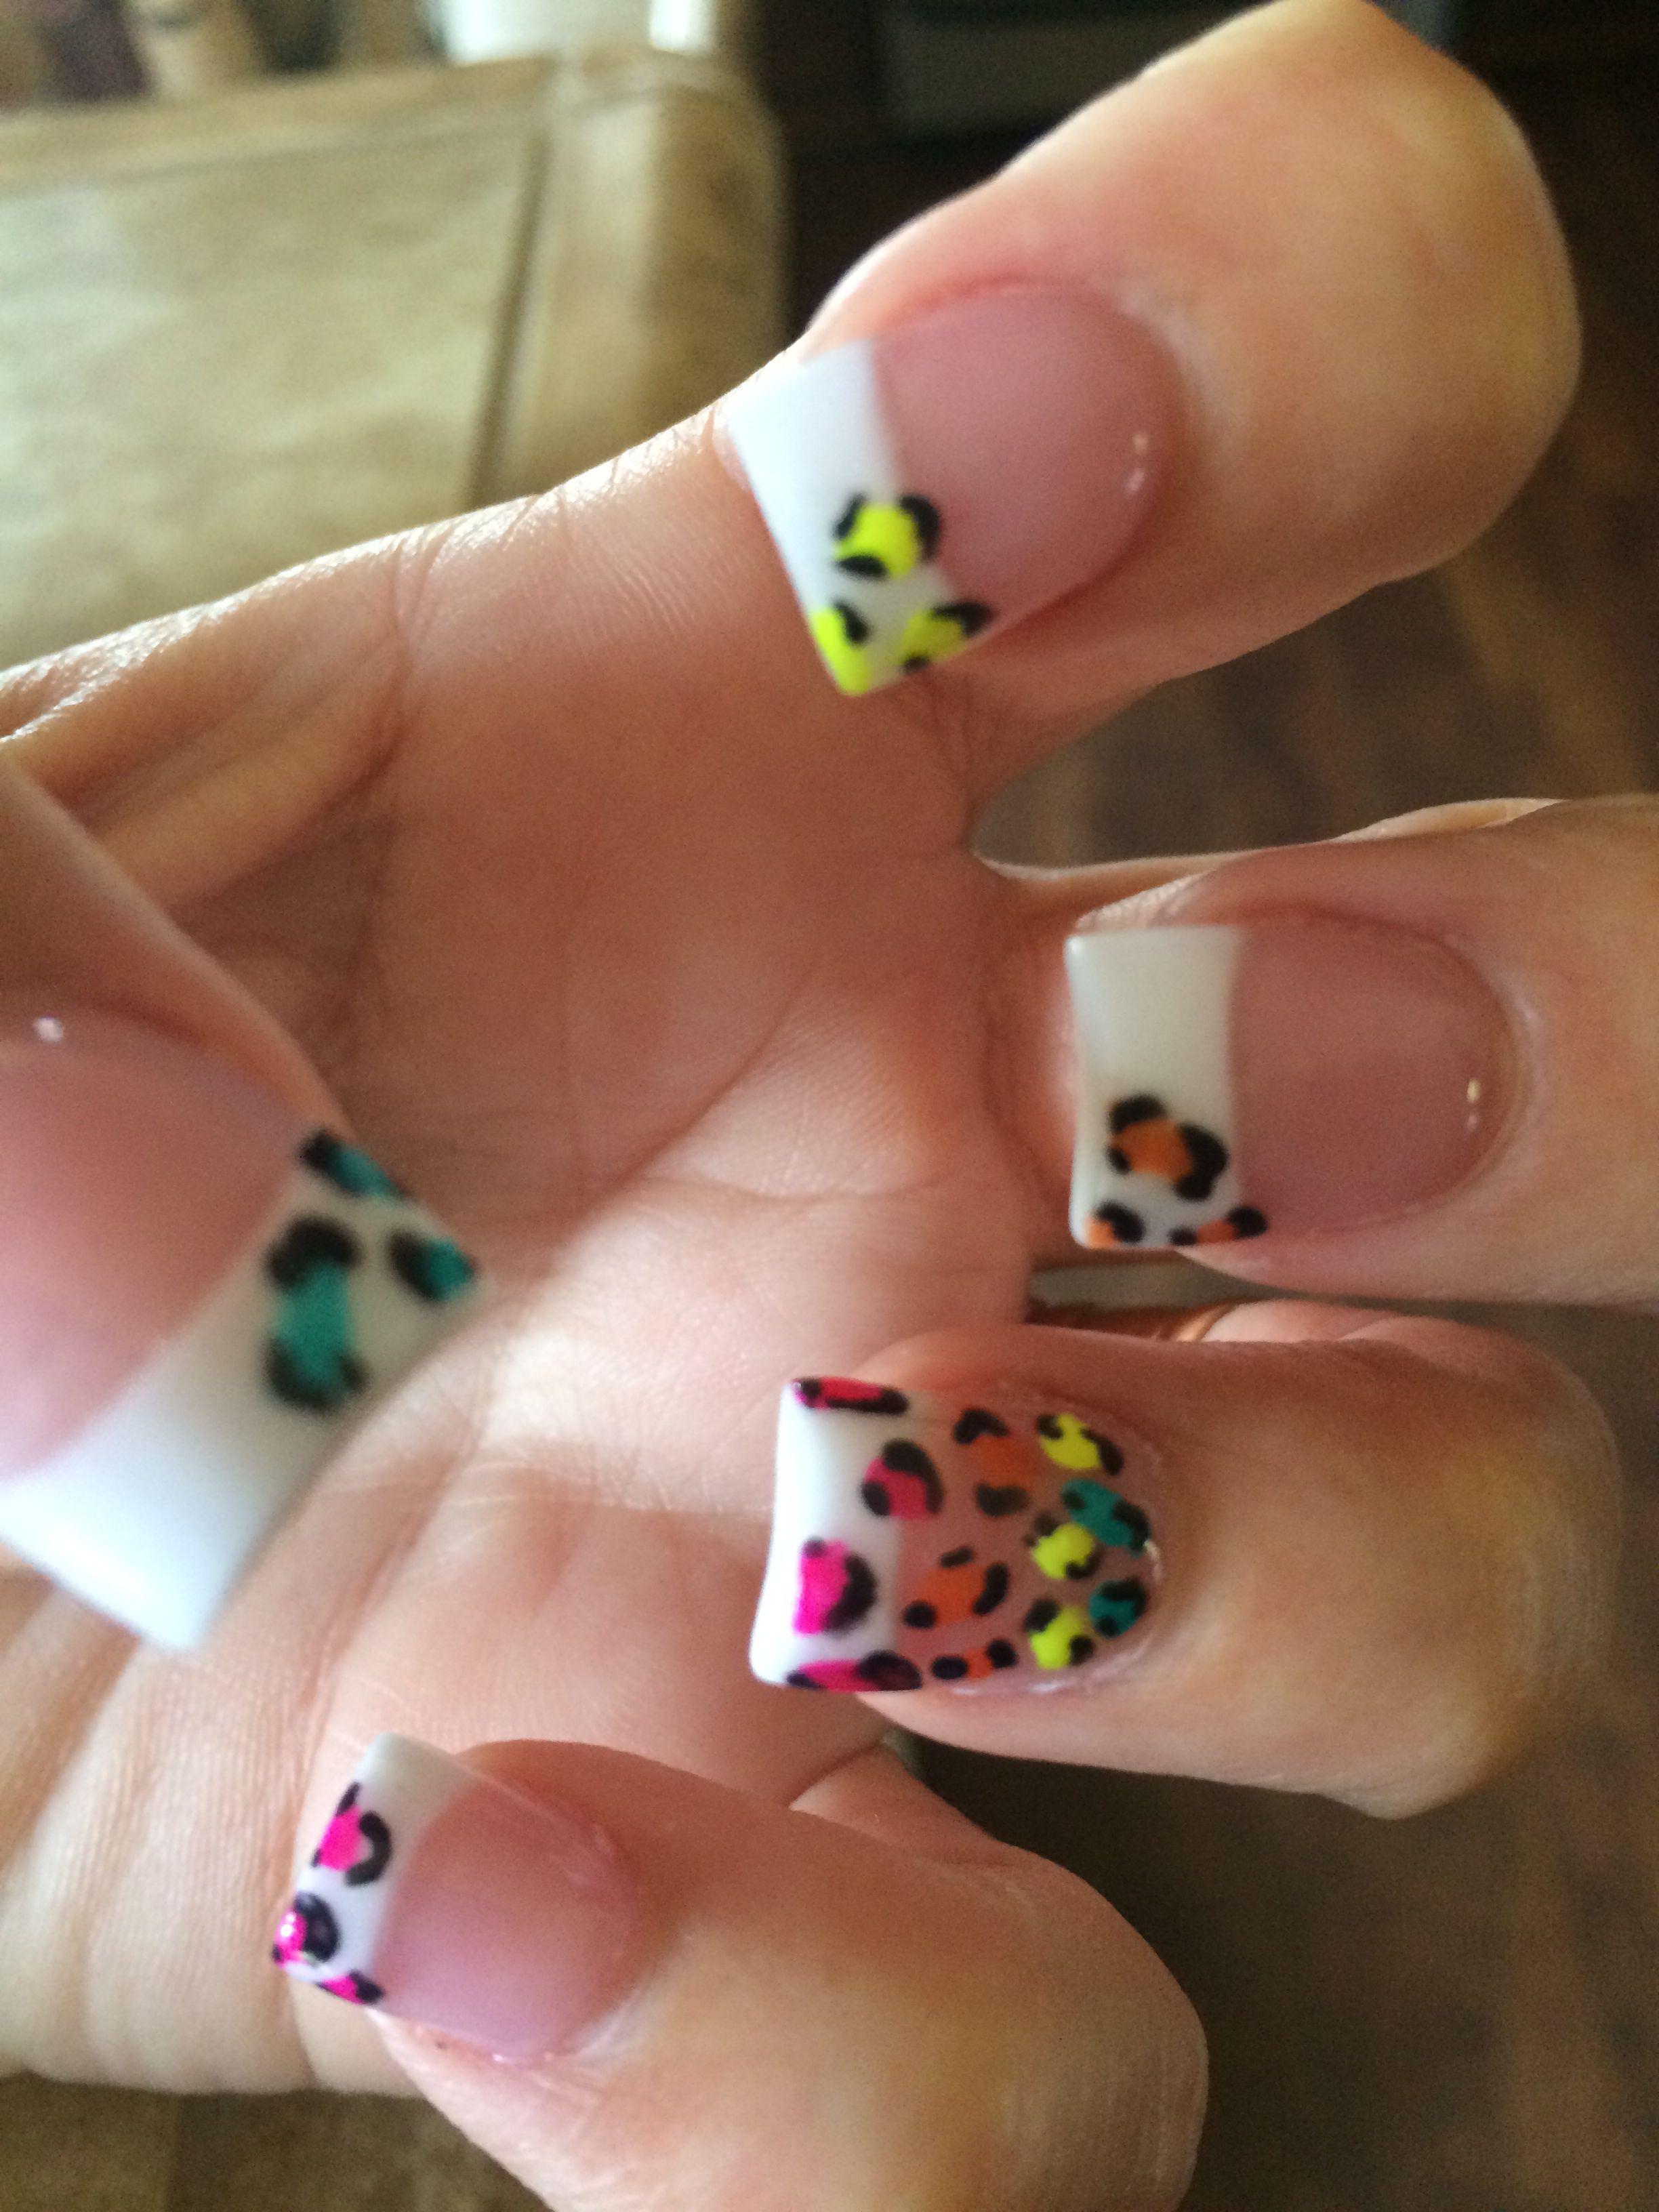 Summer nails 2014 - nails | Pinterest - Nagel